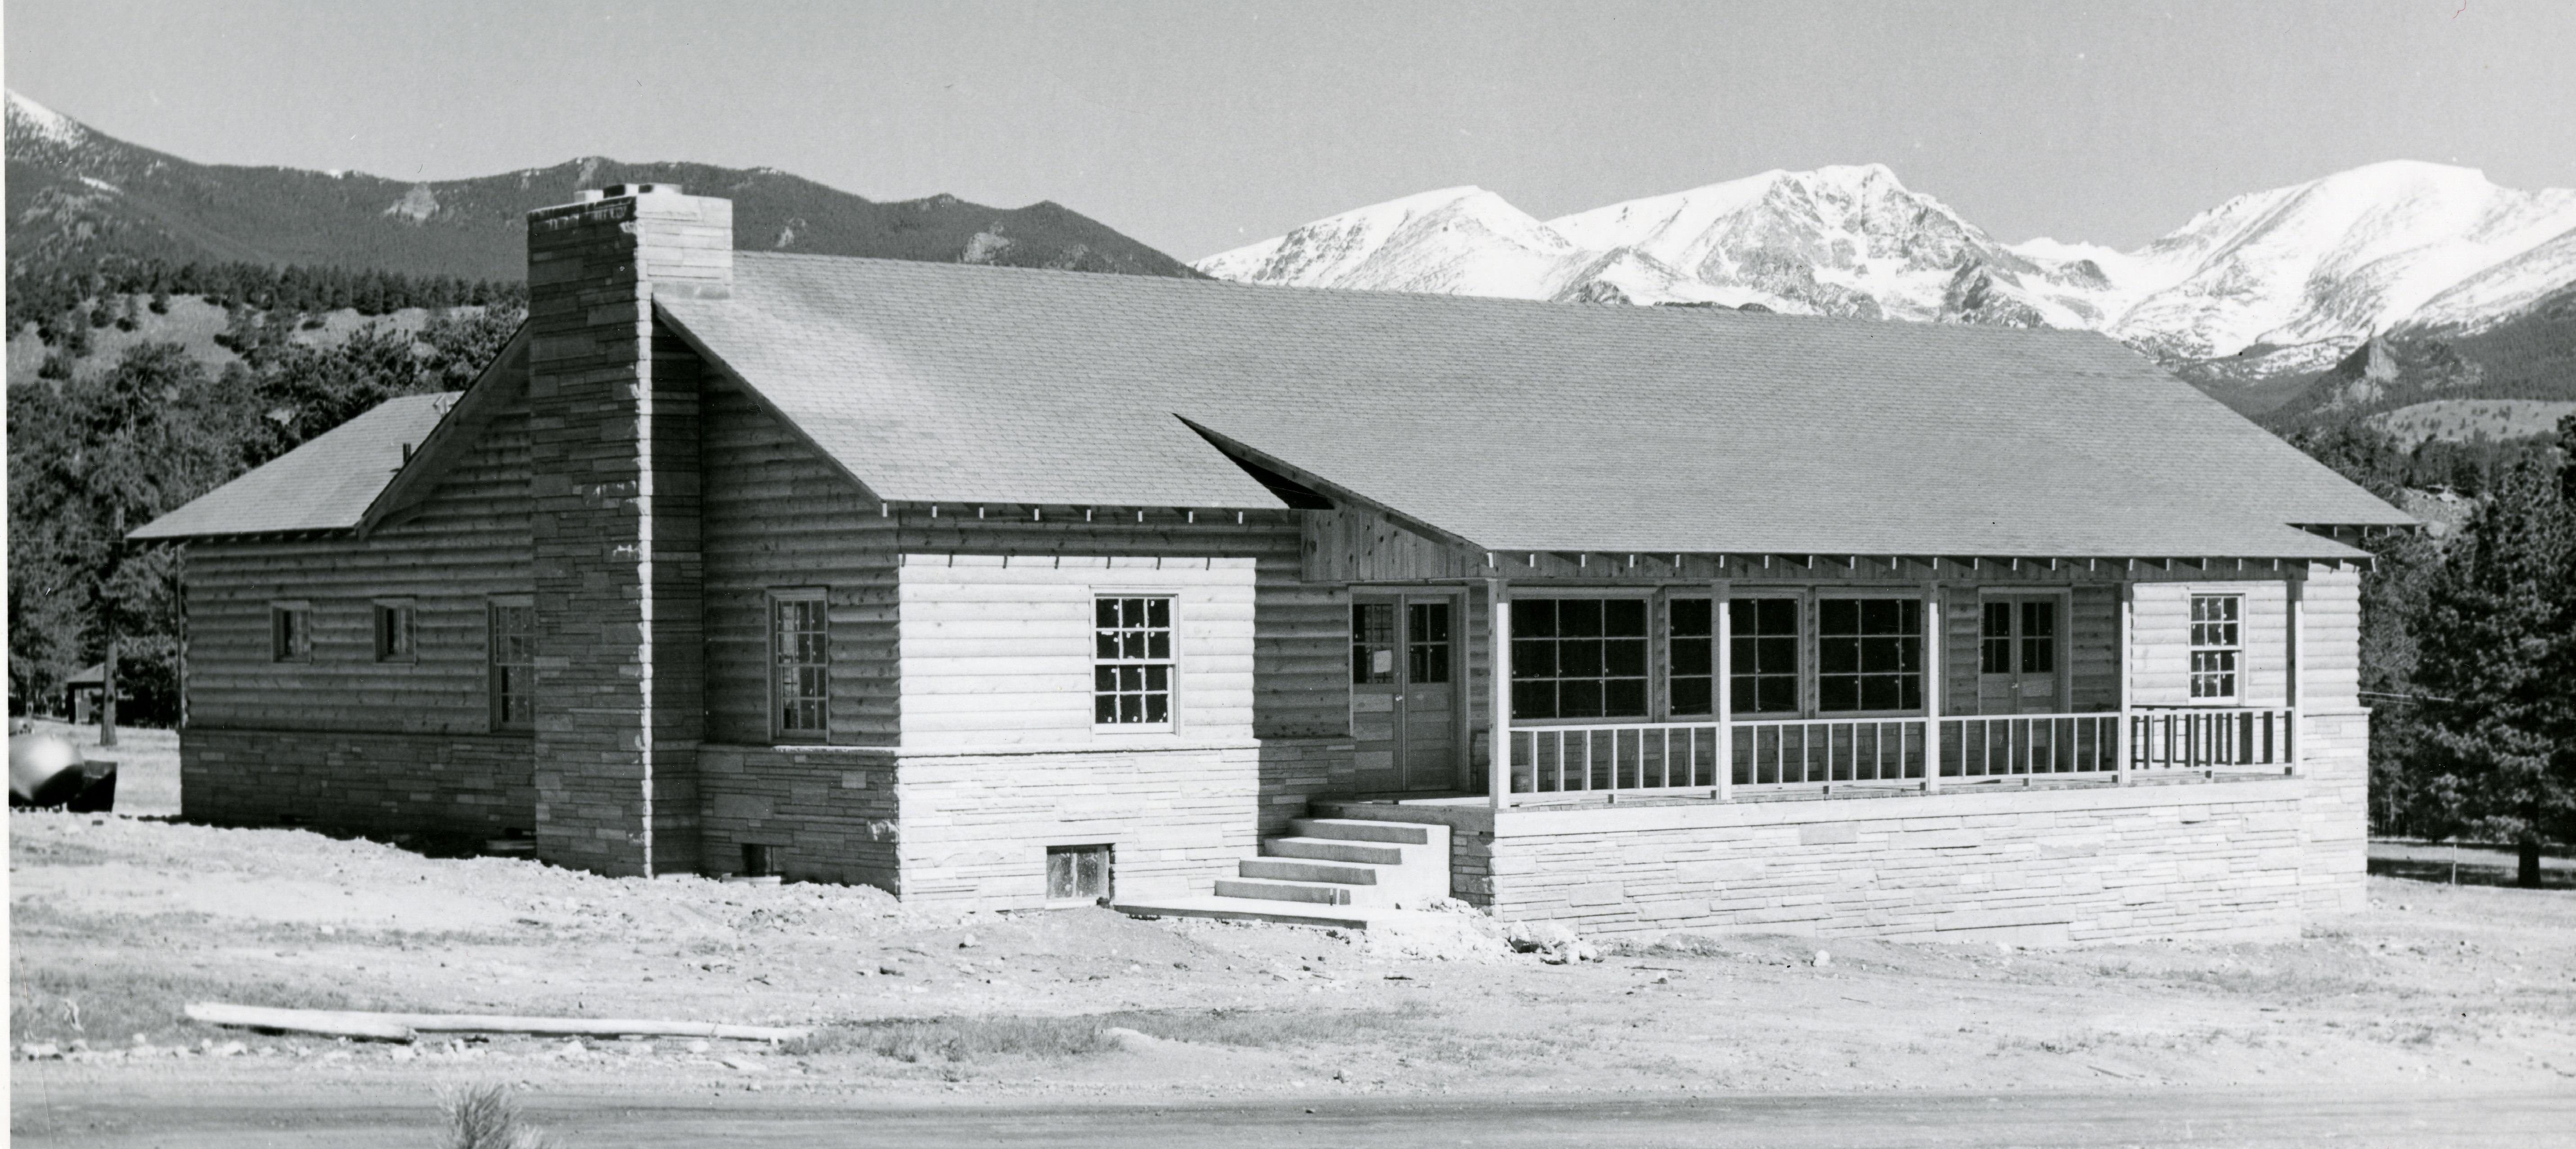 Sweet Memorial Building- 1960s